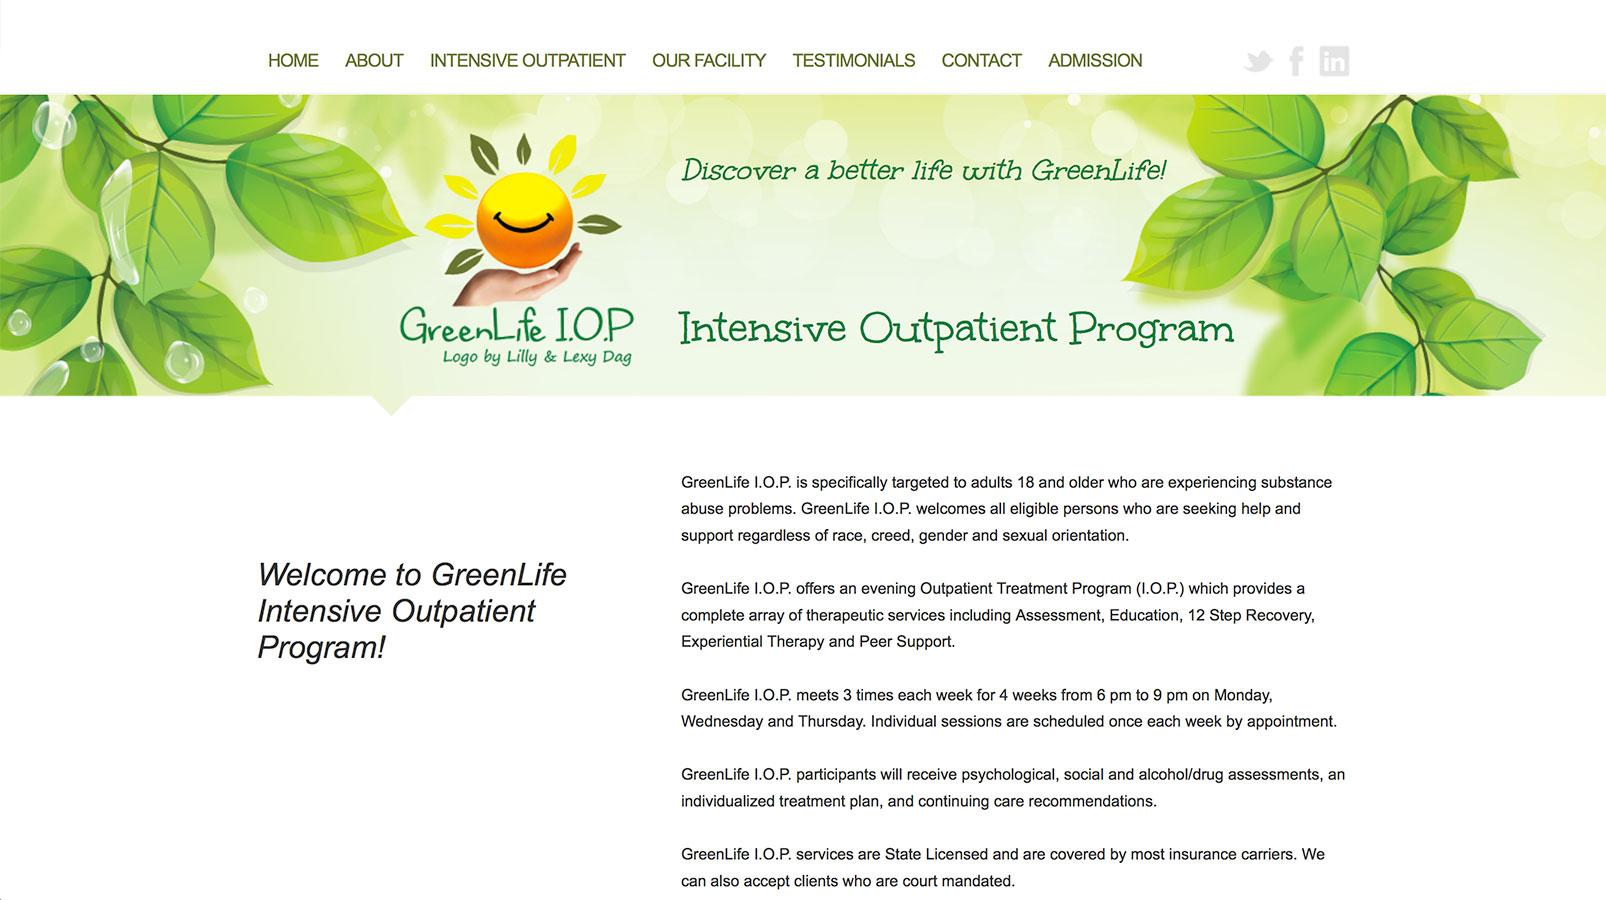 green-life-iop